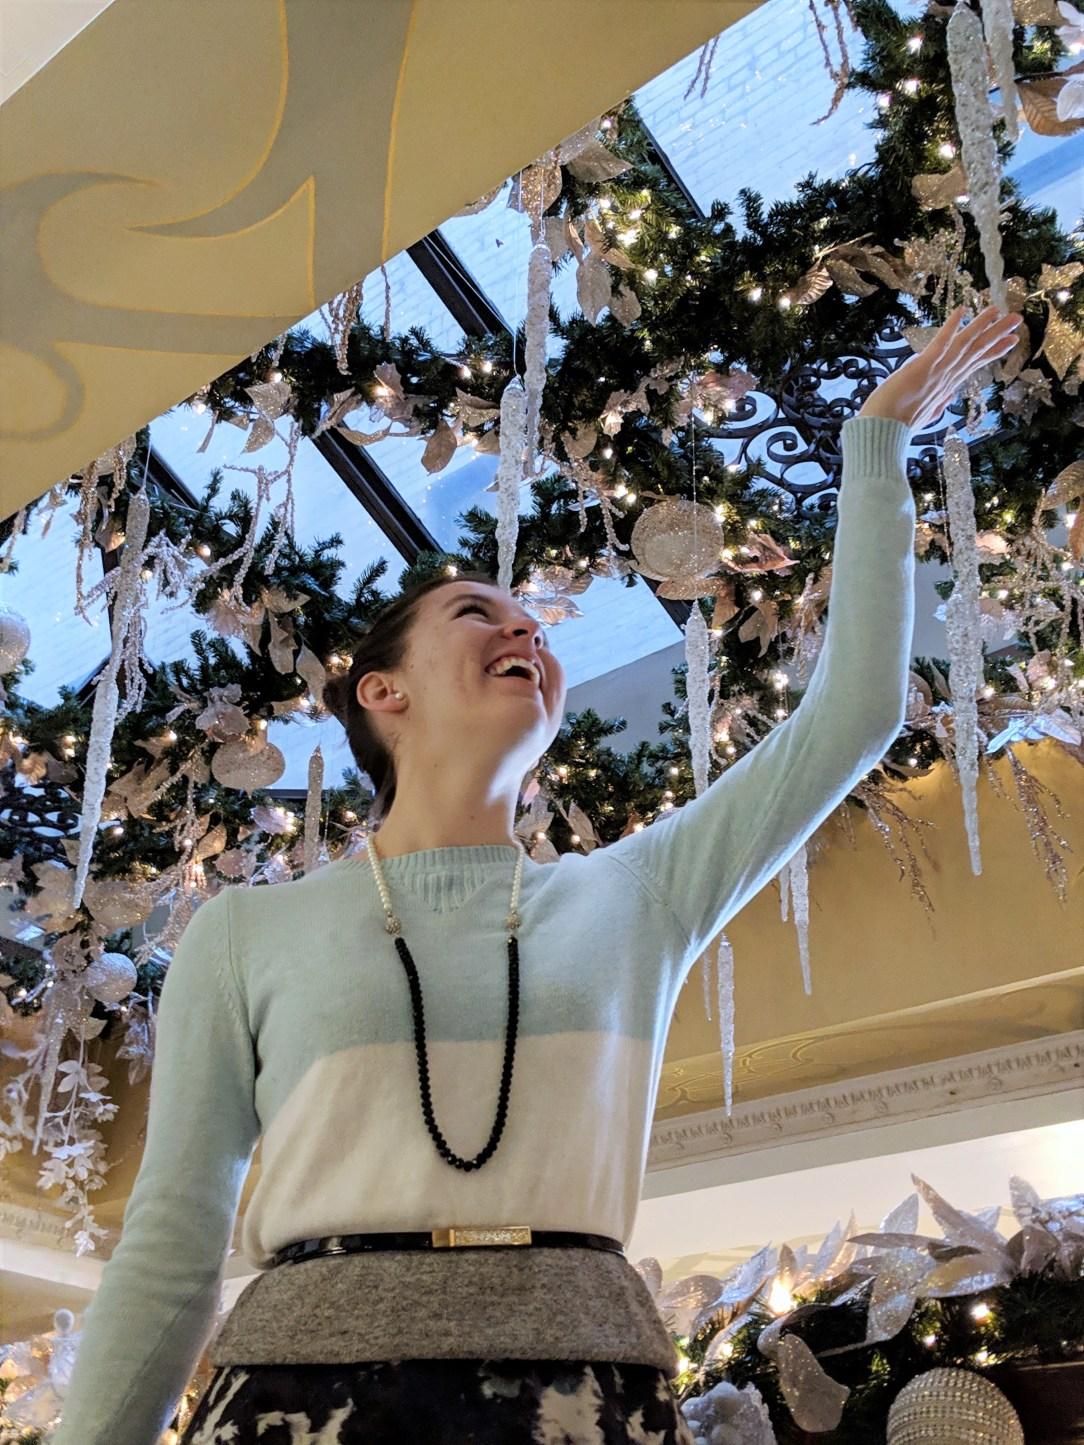 sparkles Christmas decorations snowflakes